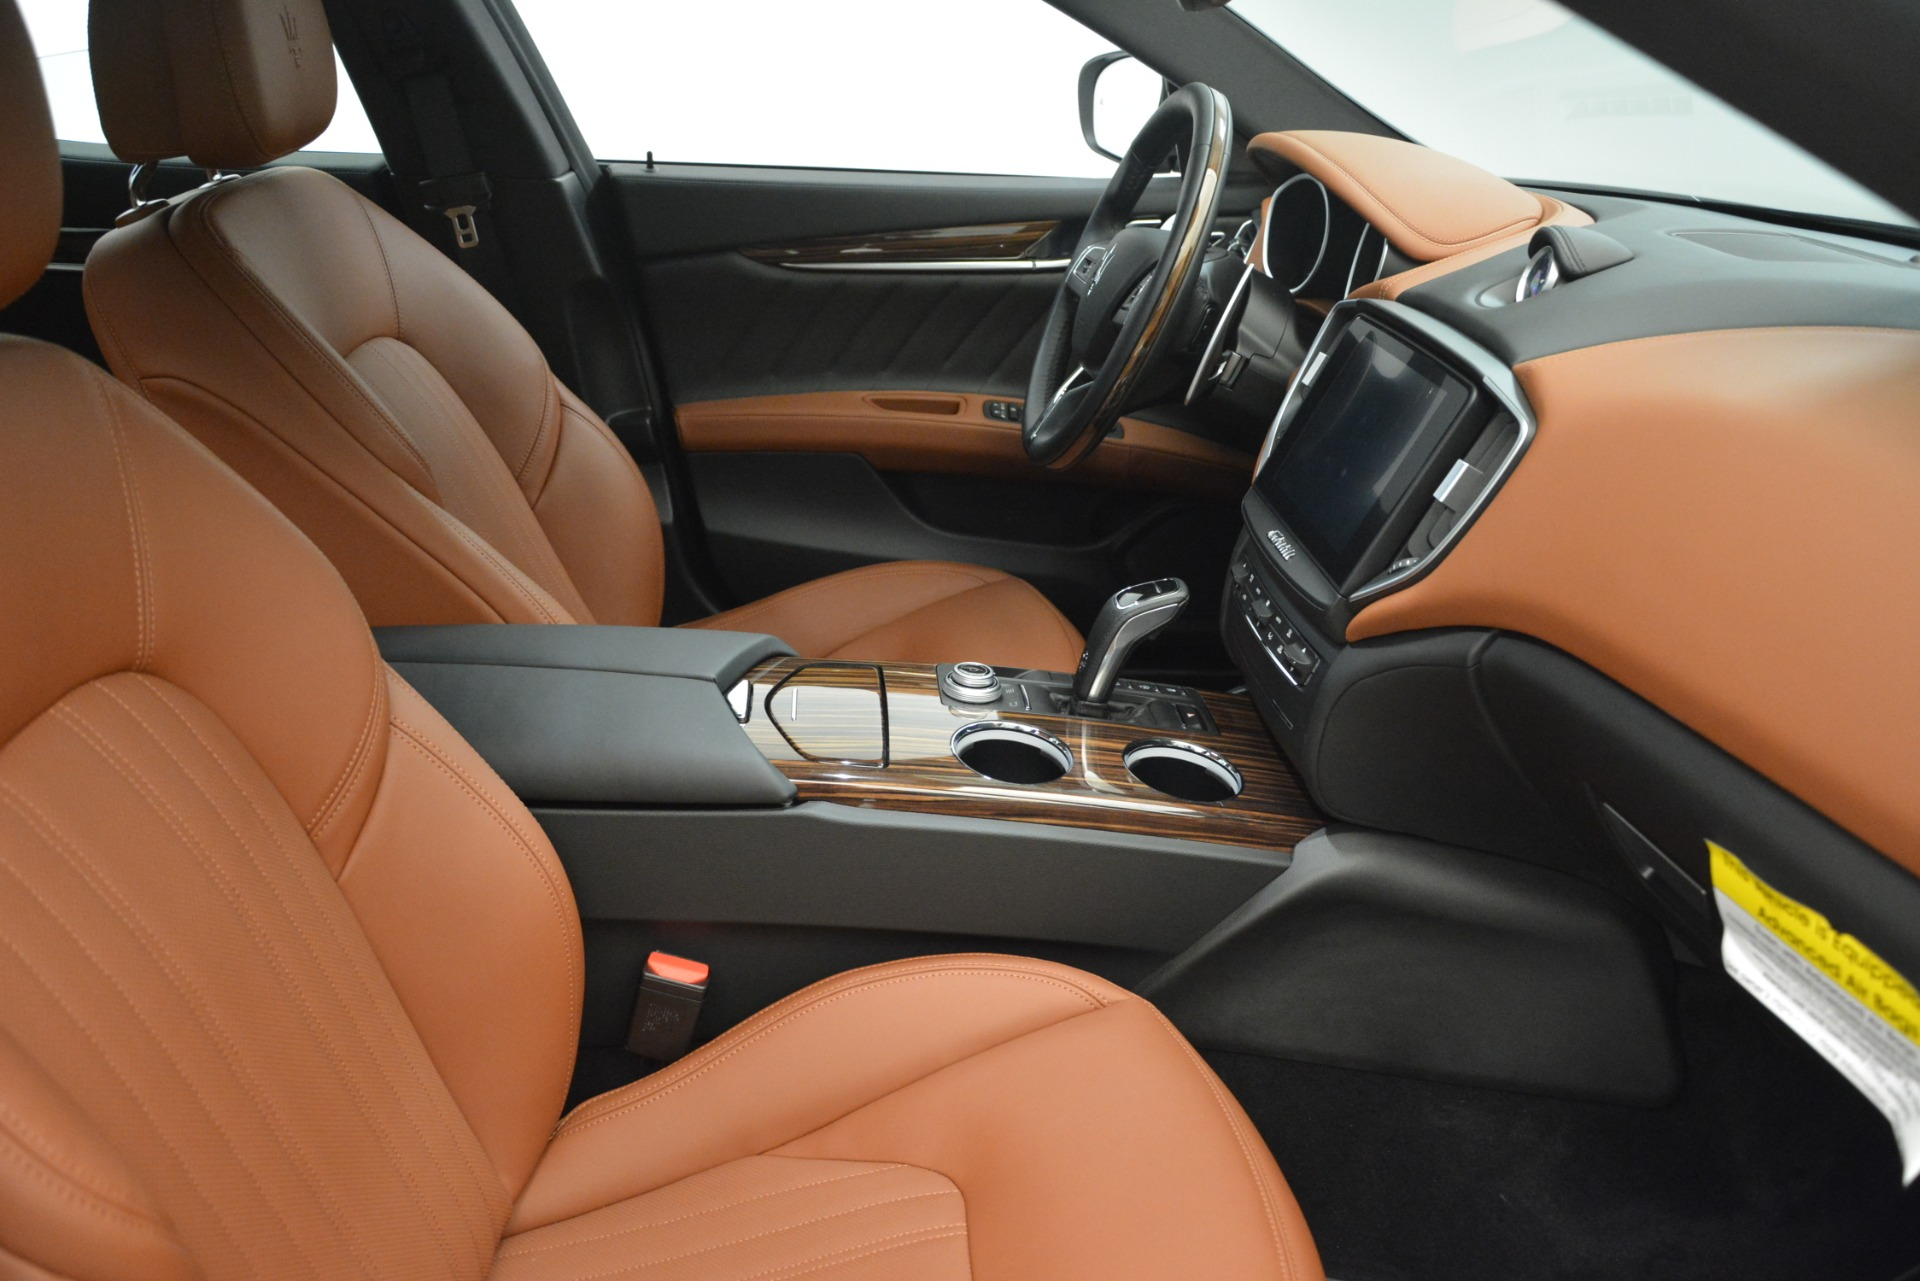 New 2019 Maserati Ghibli S Q4 GranLusso For Sale In Westport, CT 2590_p21